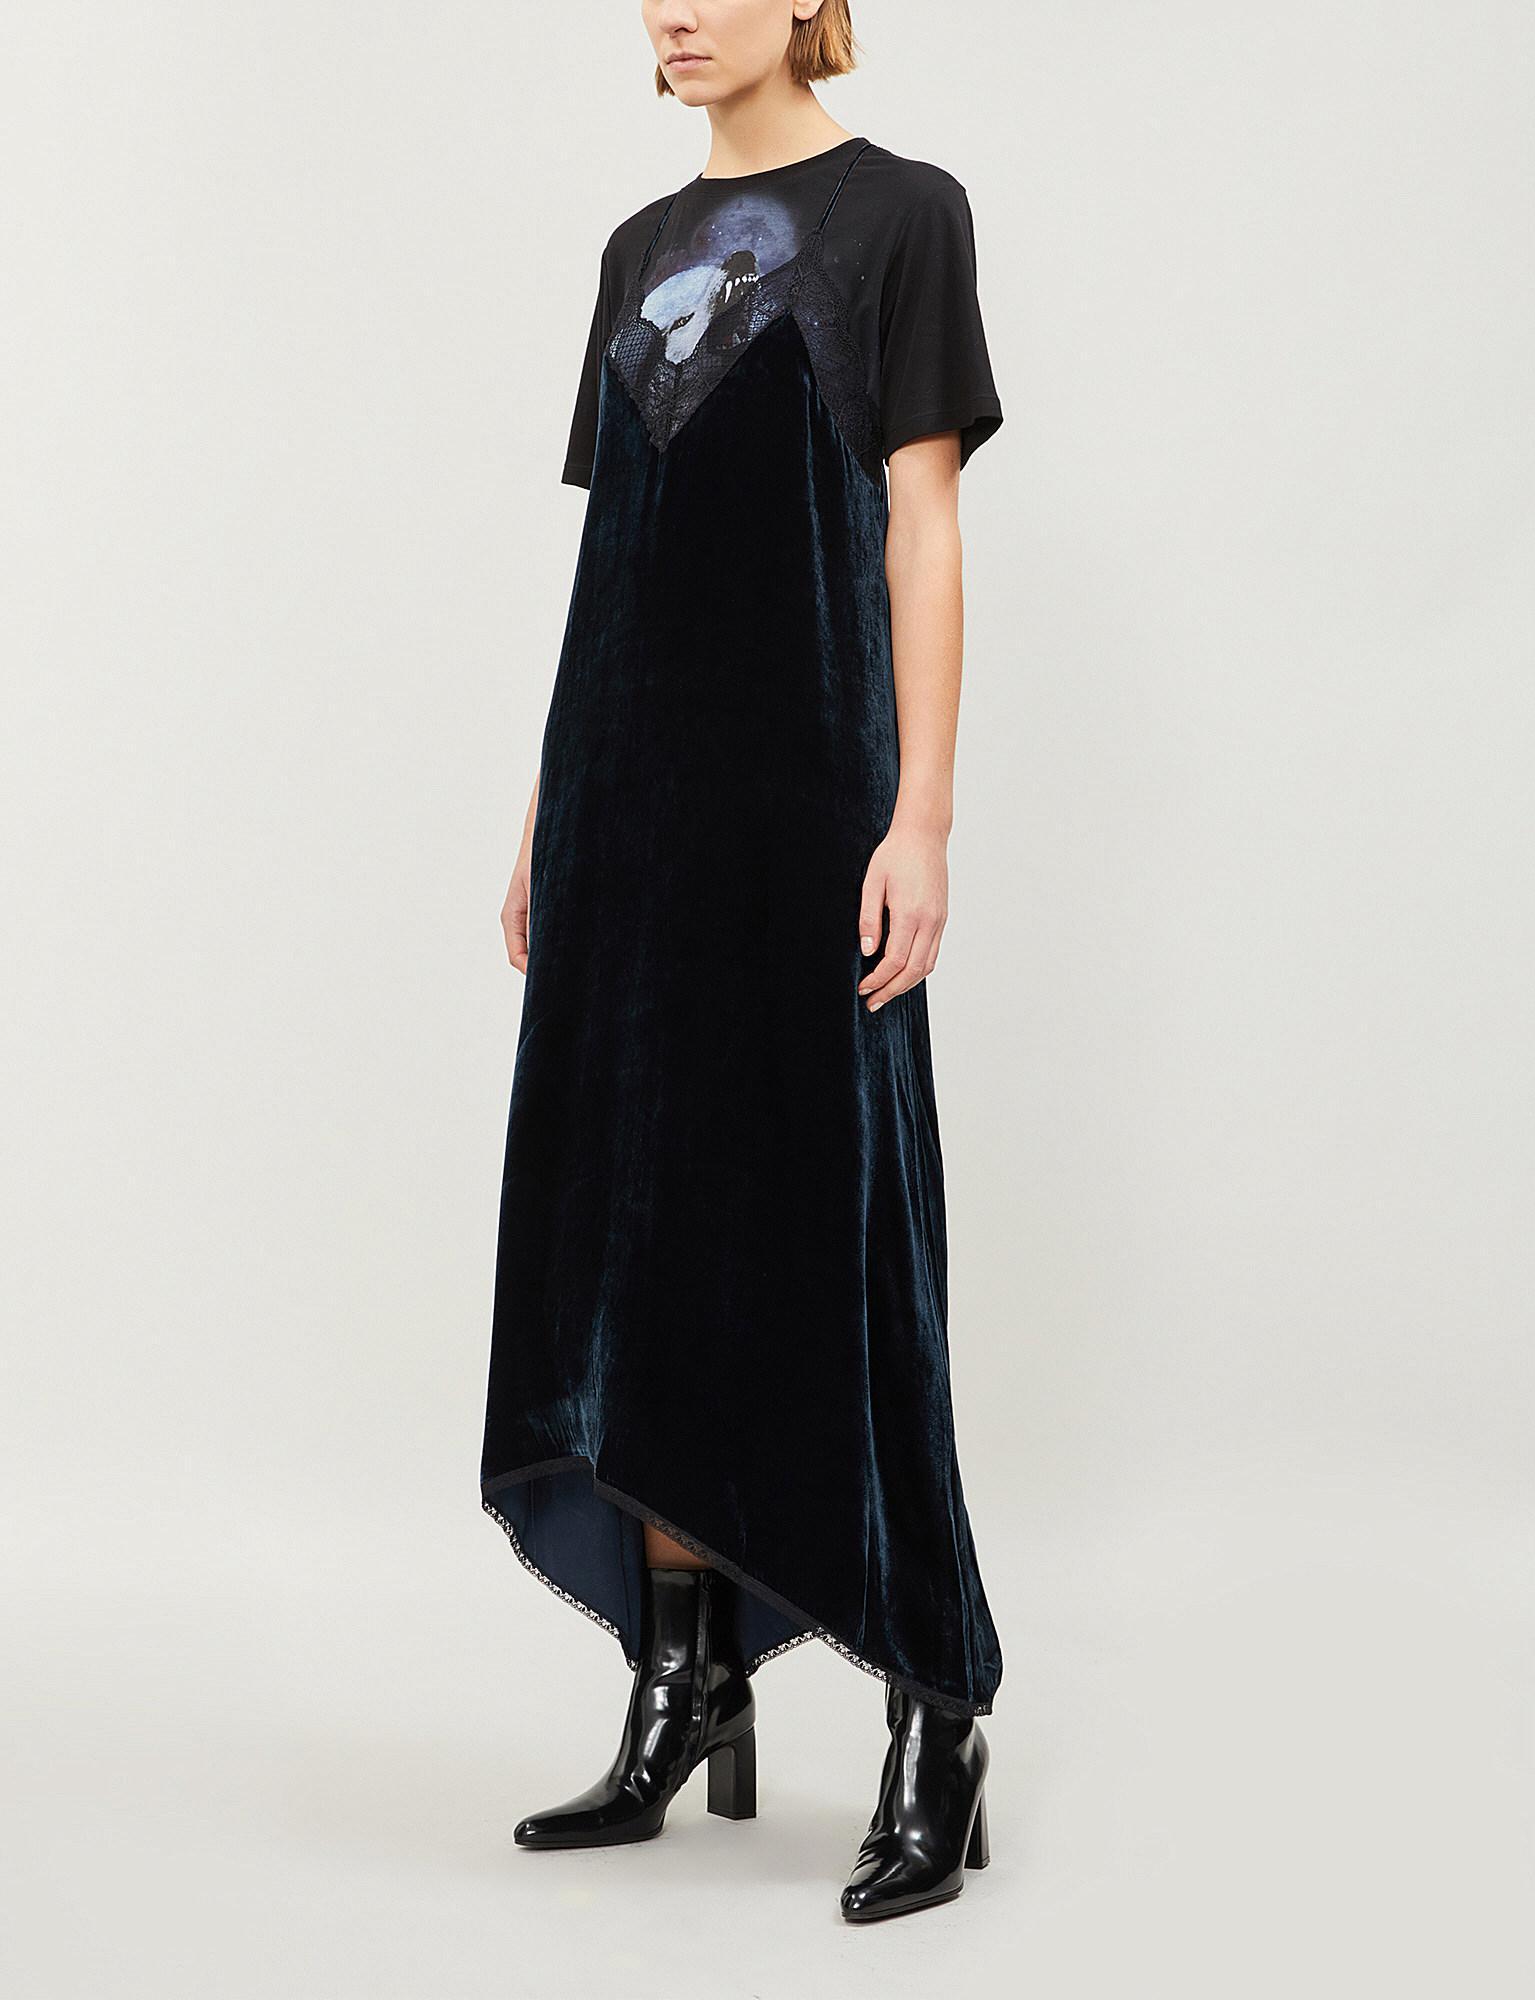 Dress Risty In Black Zadig Lace Trim Velvet Lyst Voltaire amp; Faqwva